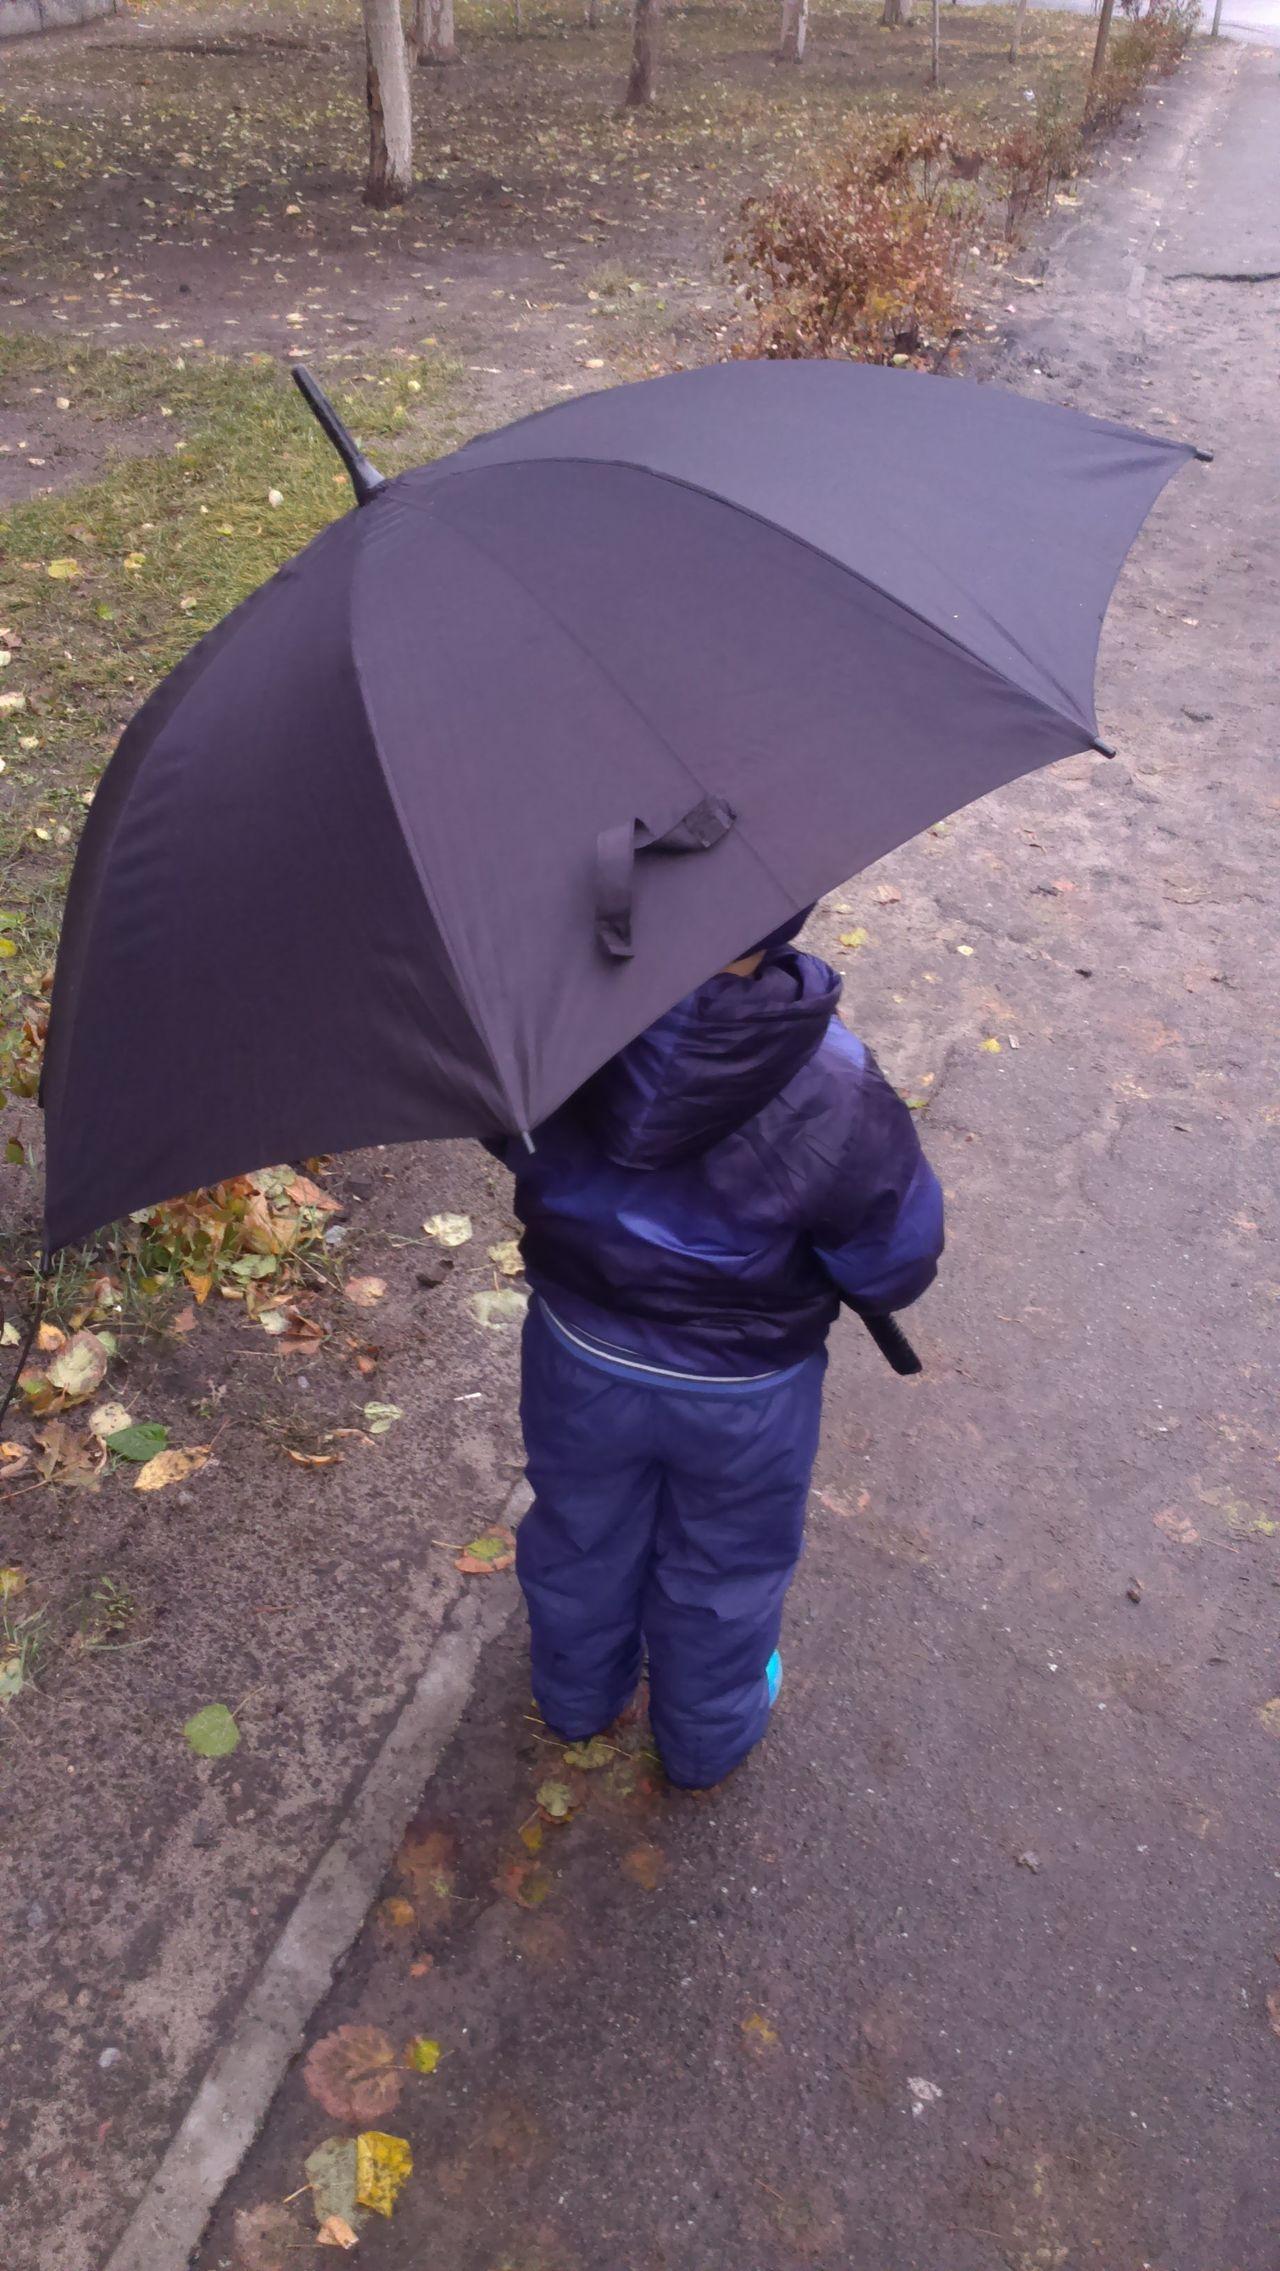 Adapted To The City Kid Kids Kids Being Kids Kids Photography Kidsphotography Rain Rainy Day Weather Weather Photography Weathered